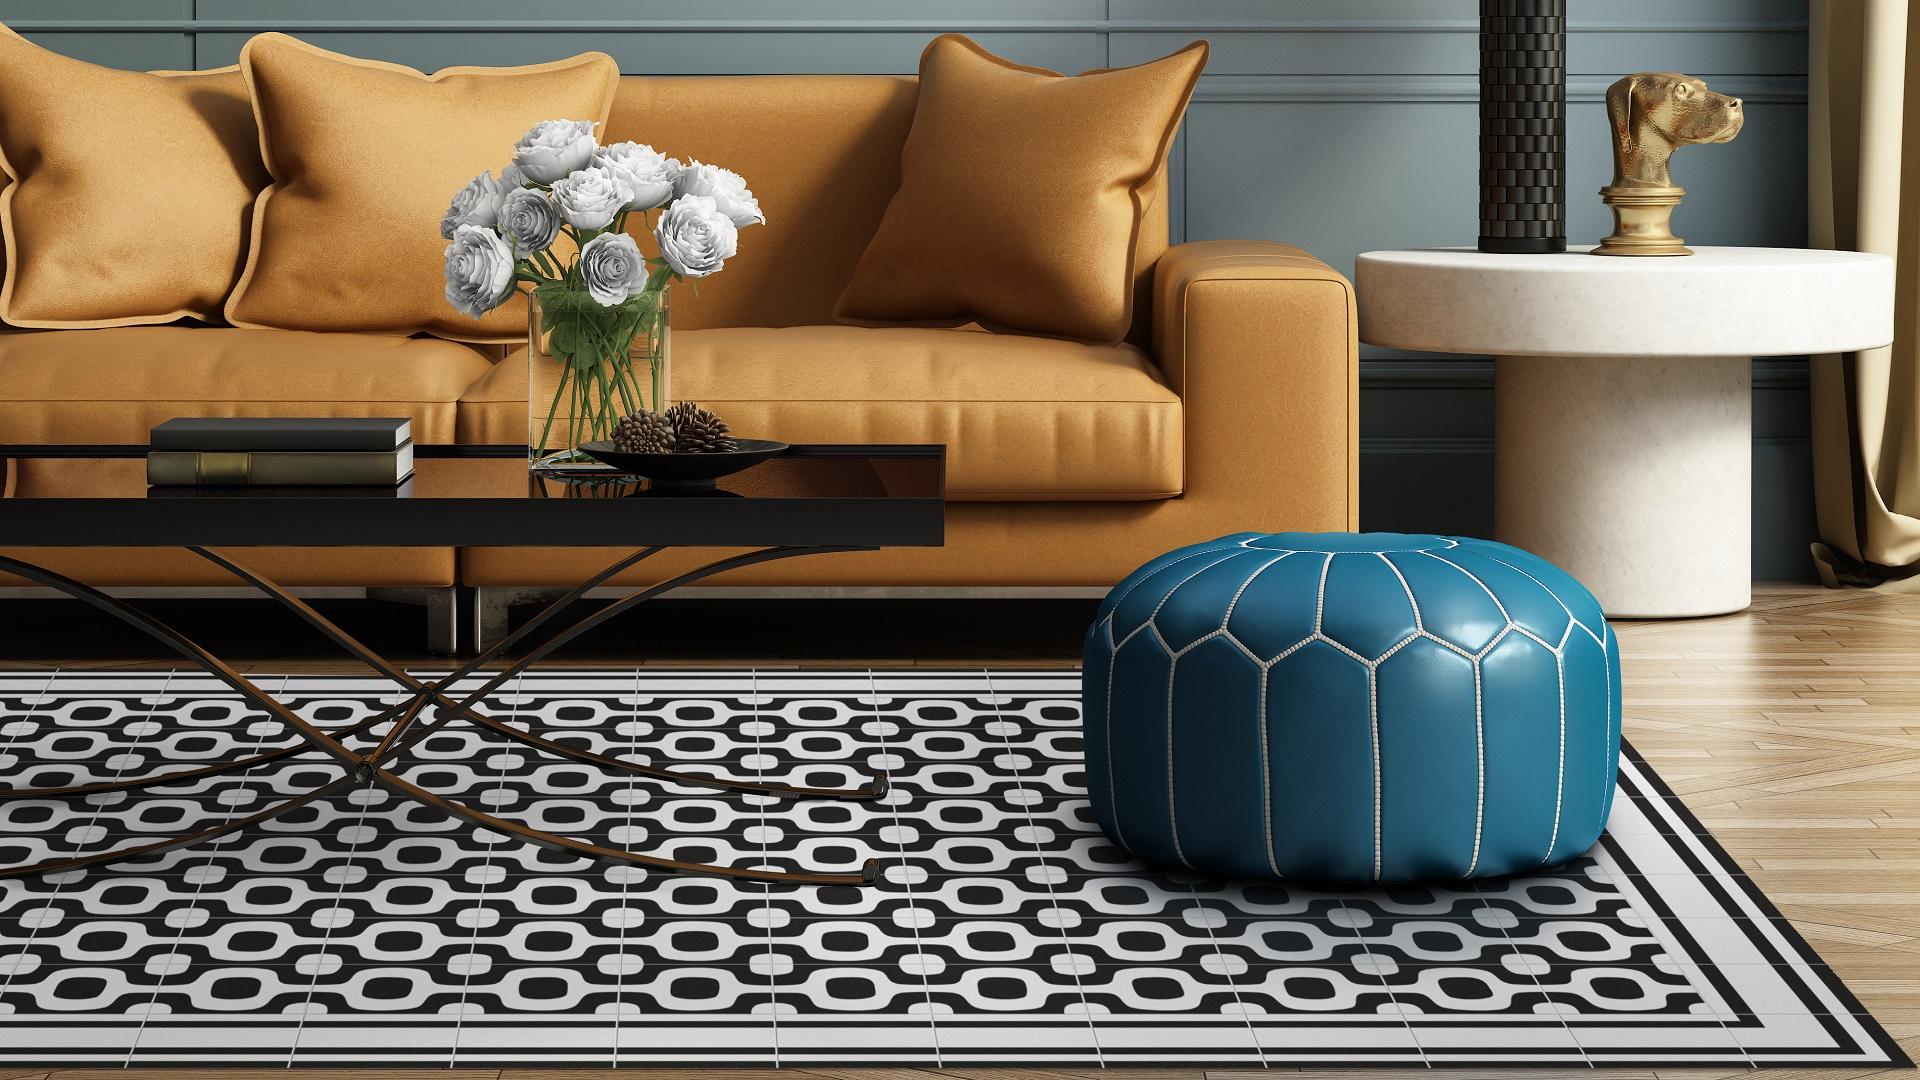 Hidraulik, alfombras vinílicas